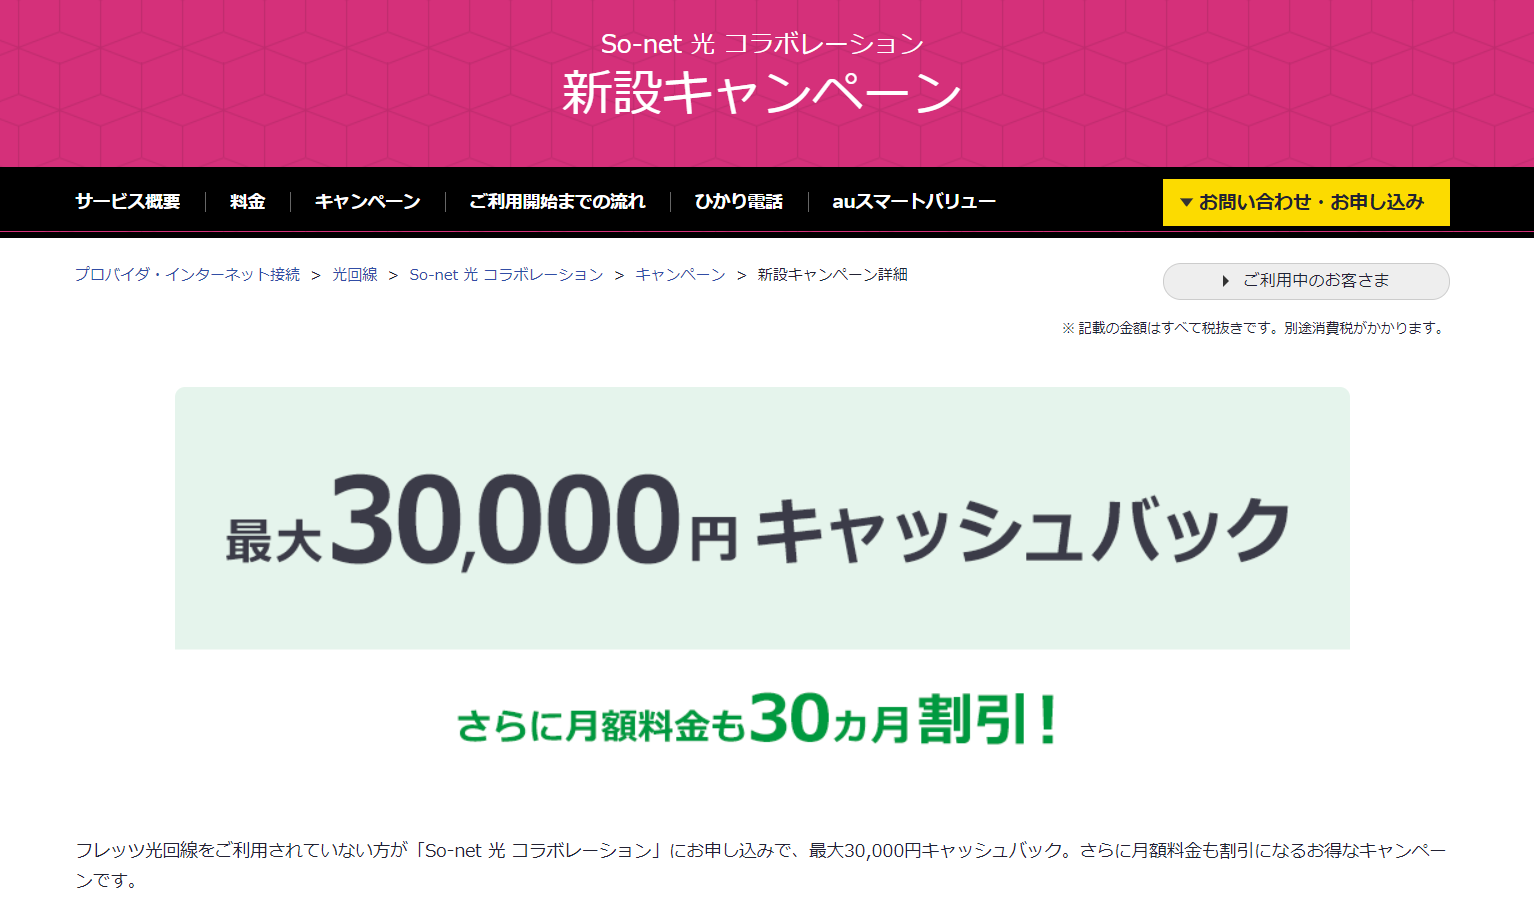 So-net 光 コラボレーション新設キャンペーン